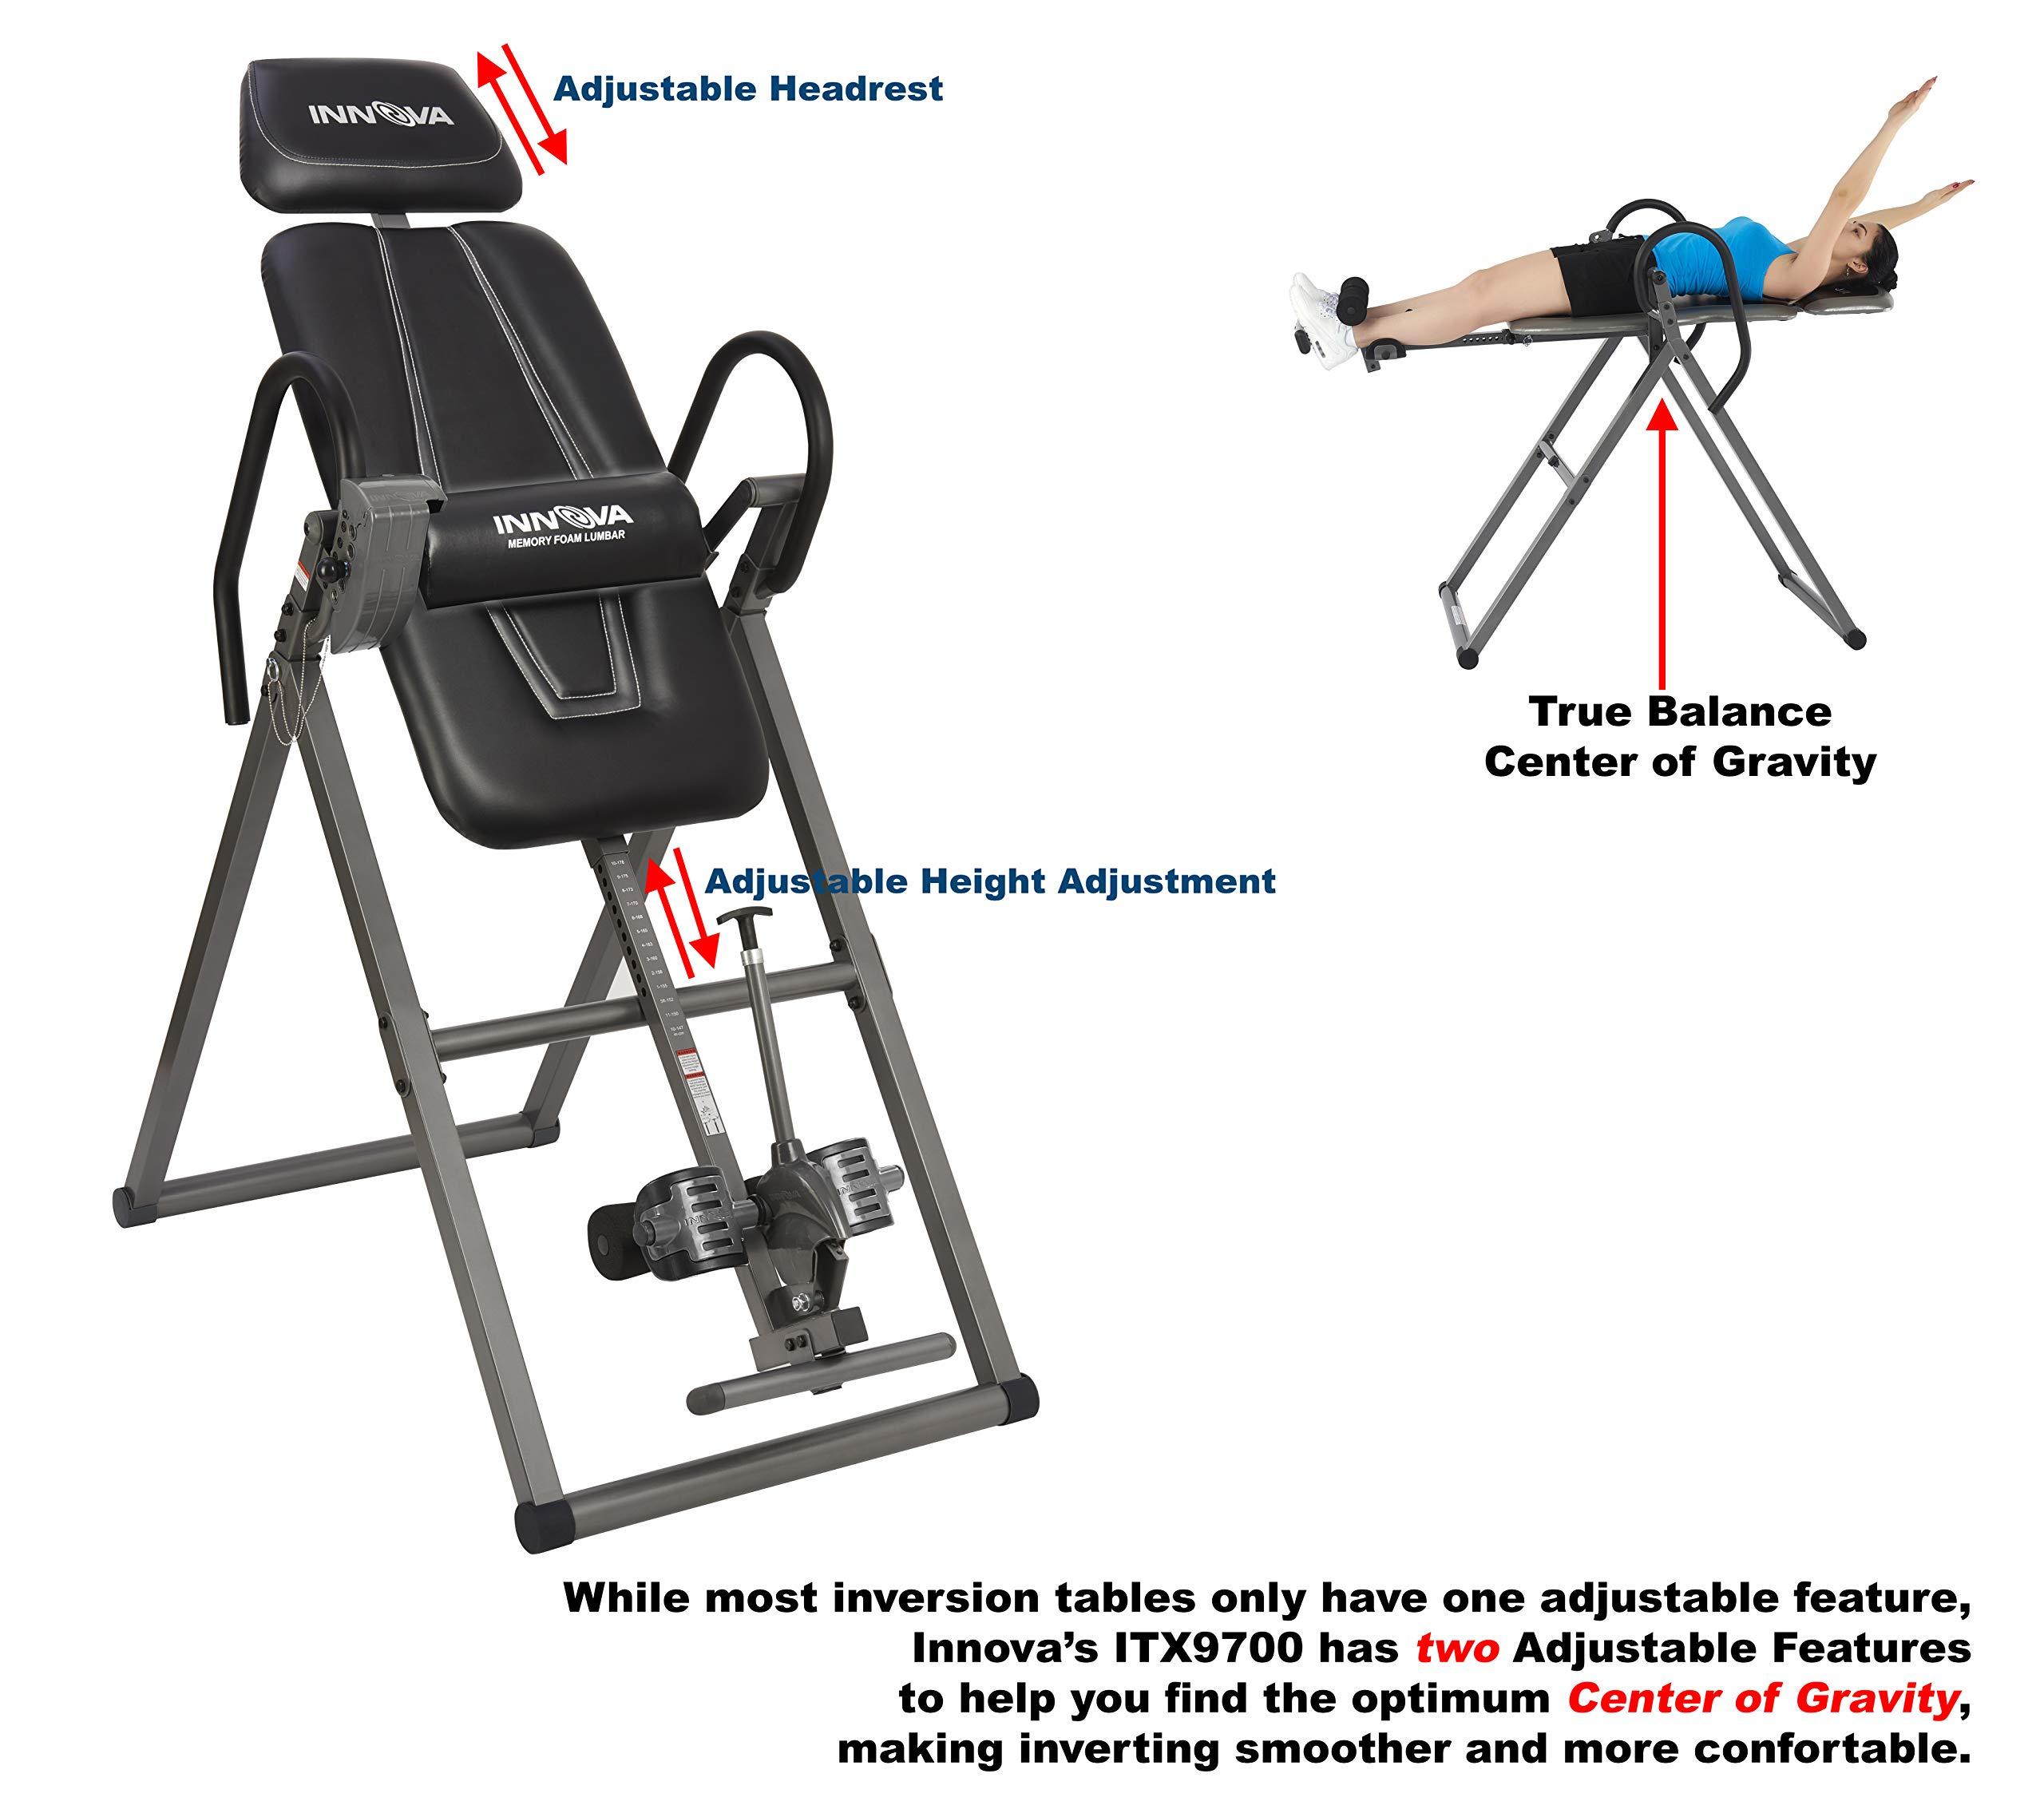 Inversion Table Heavy Duty Innova Itx9600 Therapy Adjustable Headrest Gravity